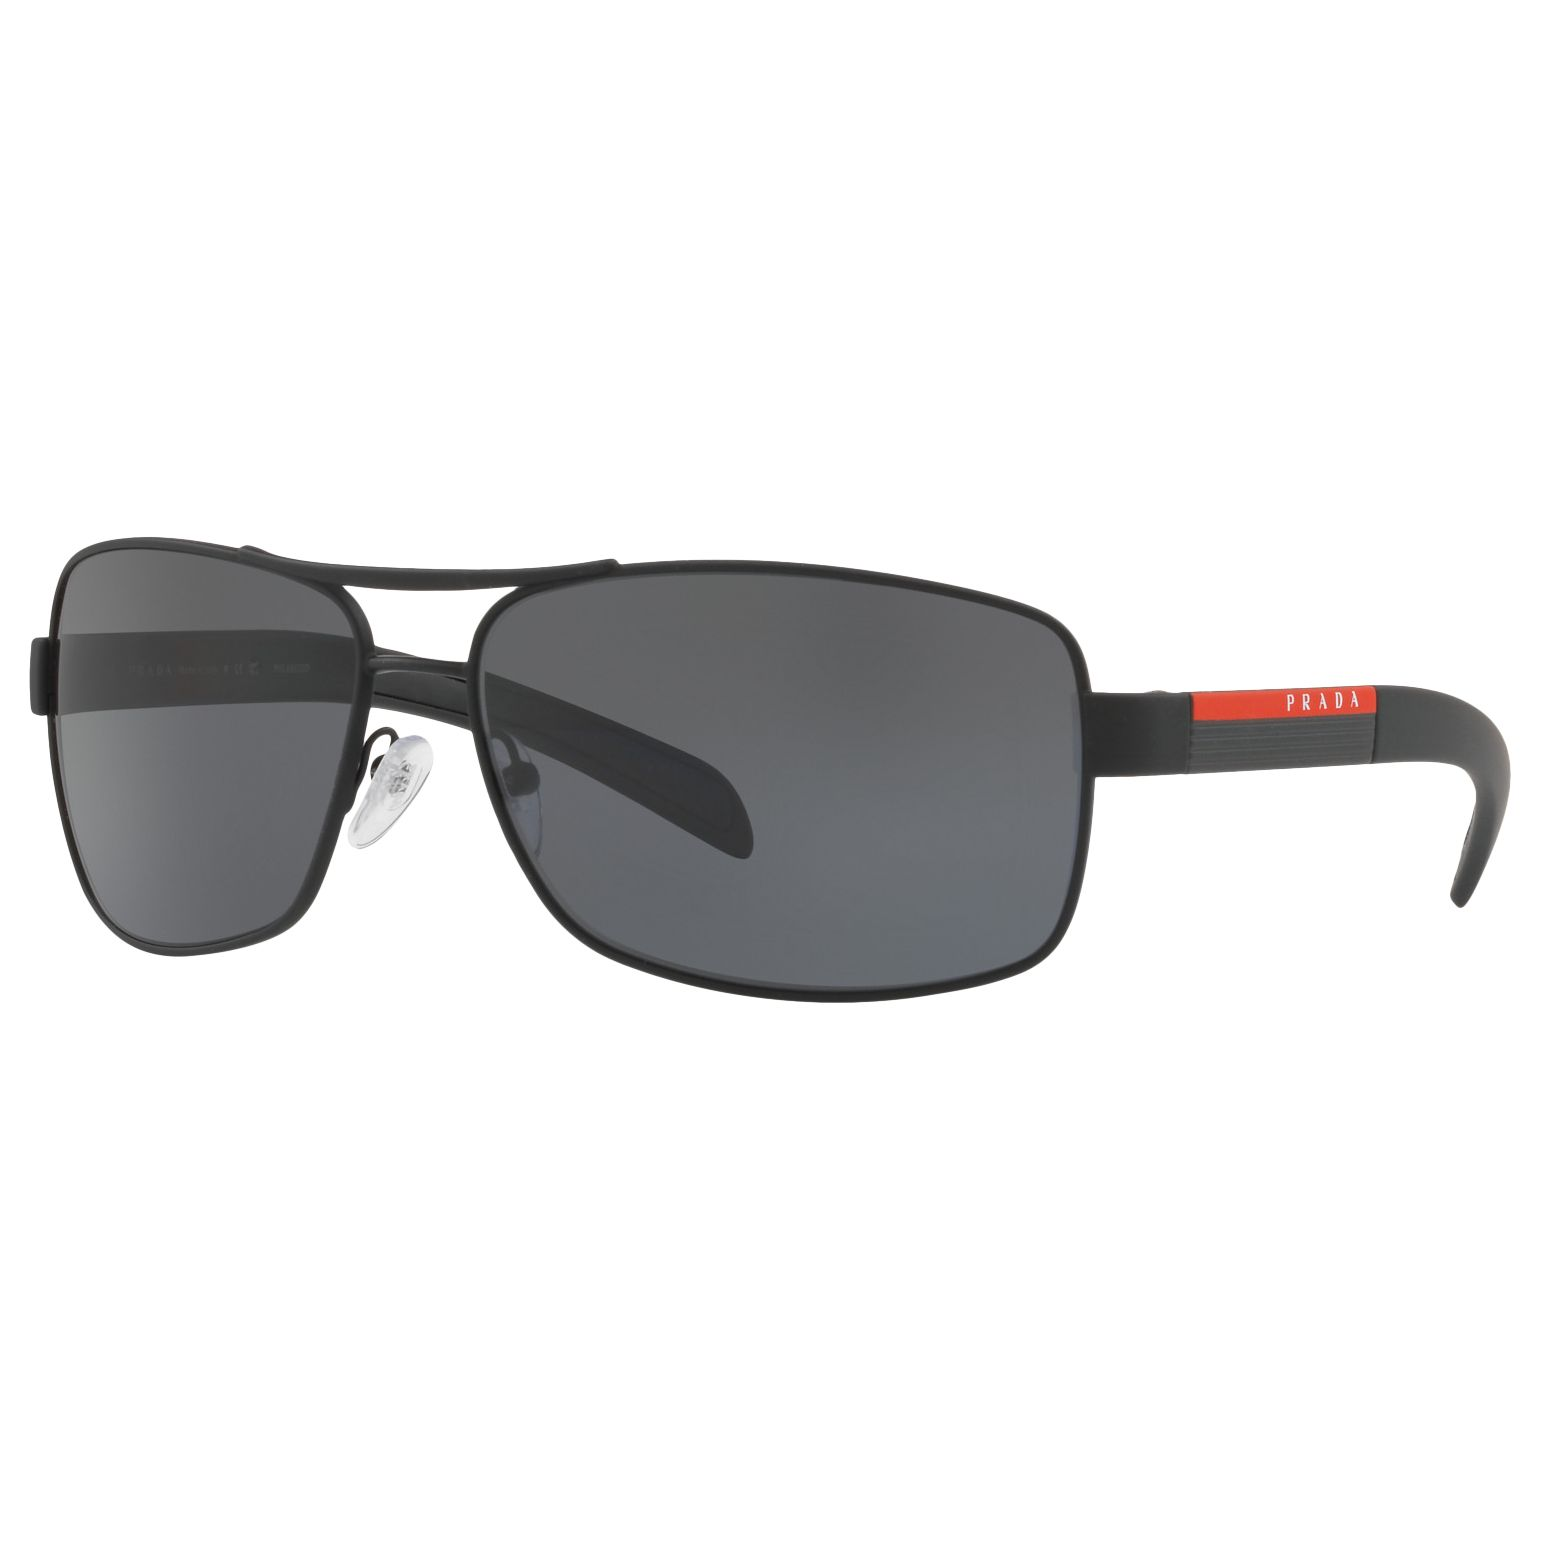 06beb3d50e5 Prada Linea Rossa PS 54IS Polarised Rectangular Sunglasses at John Lewis    Partners